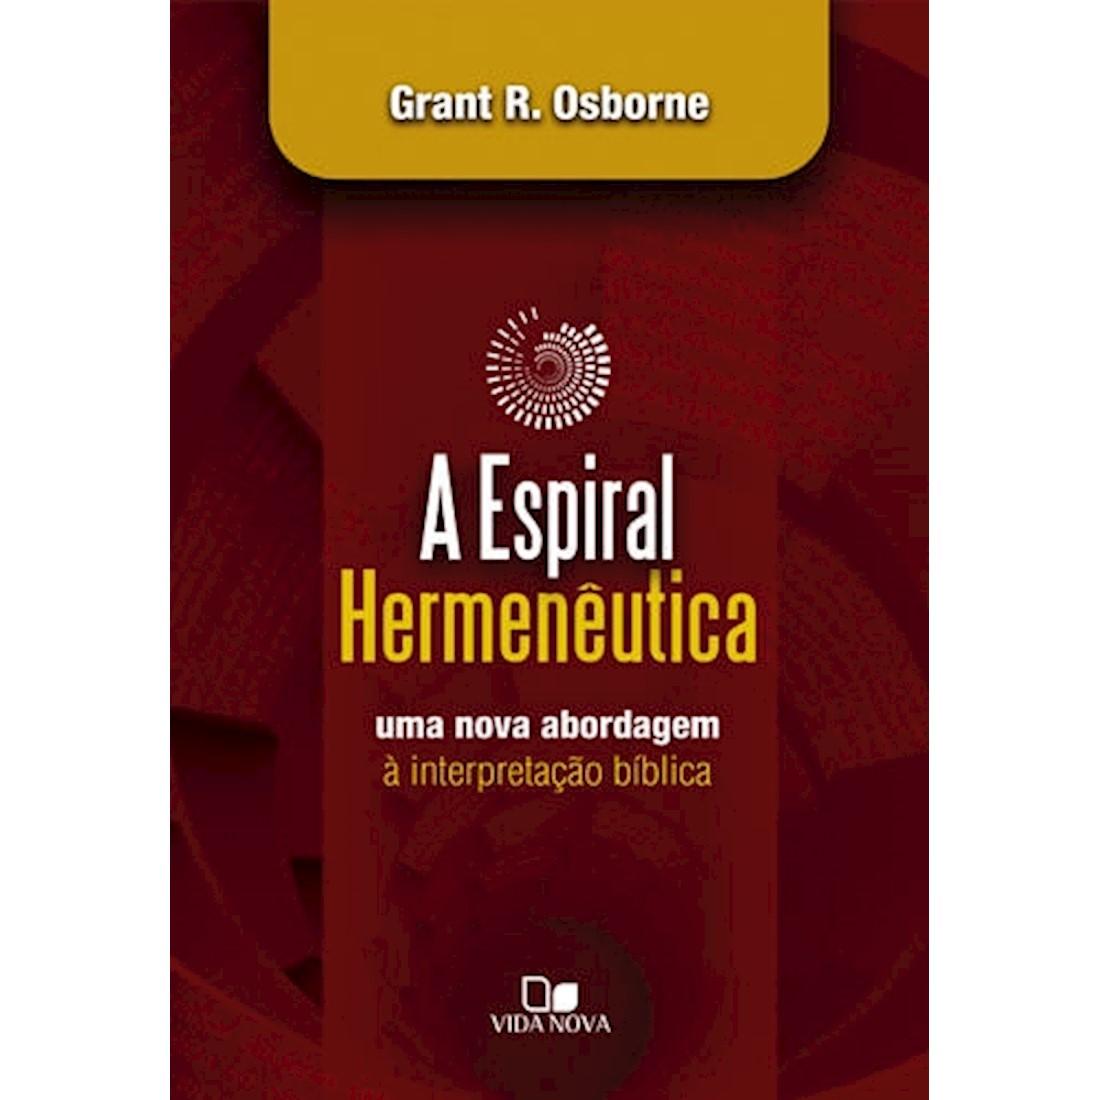 Livro A Espiral Hermenêutica